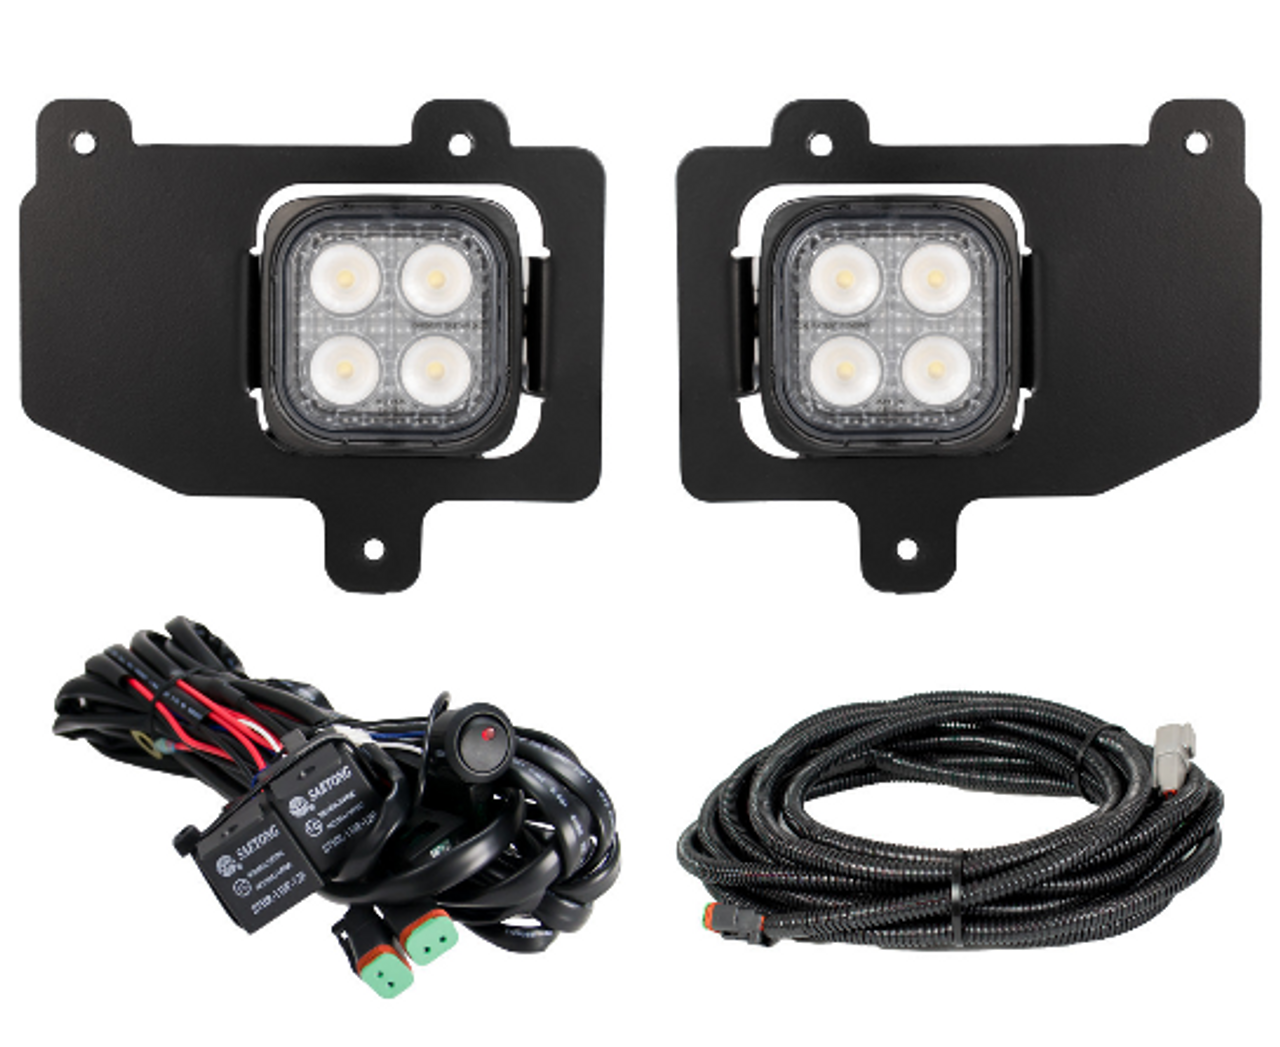 Vision X 5691202 Reverse Light Kit for Jeep Gladiator JT 2020+